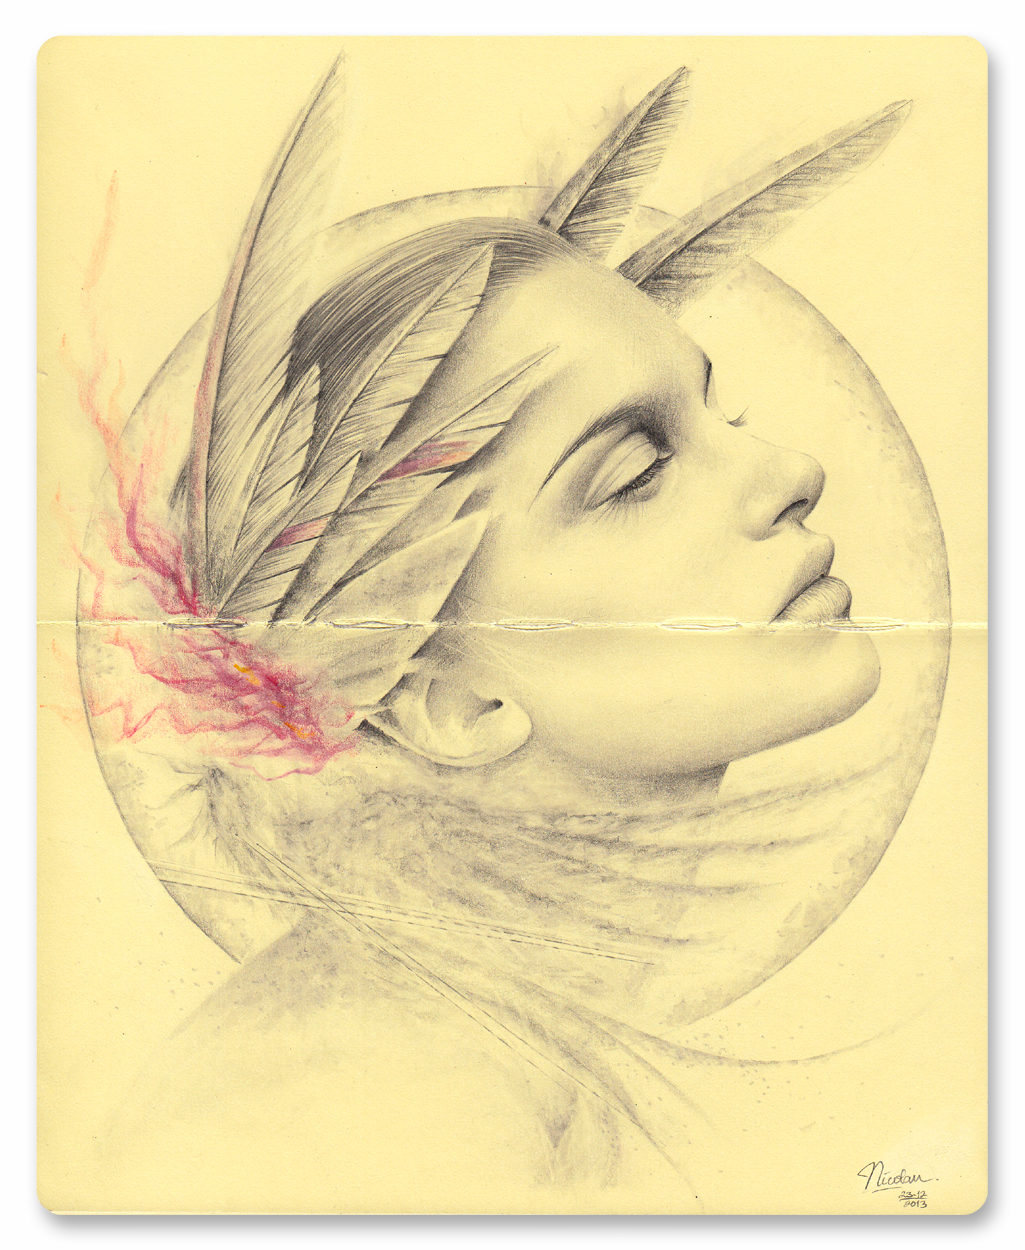 nuncalosabre. Dibujos | Drawings - ©Nicolaus Ferry